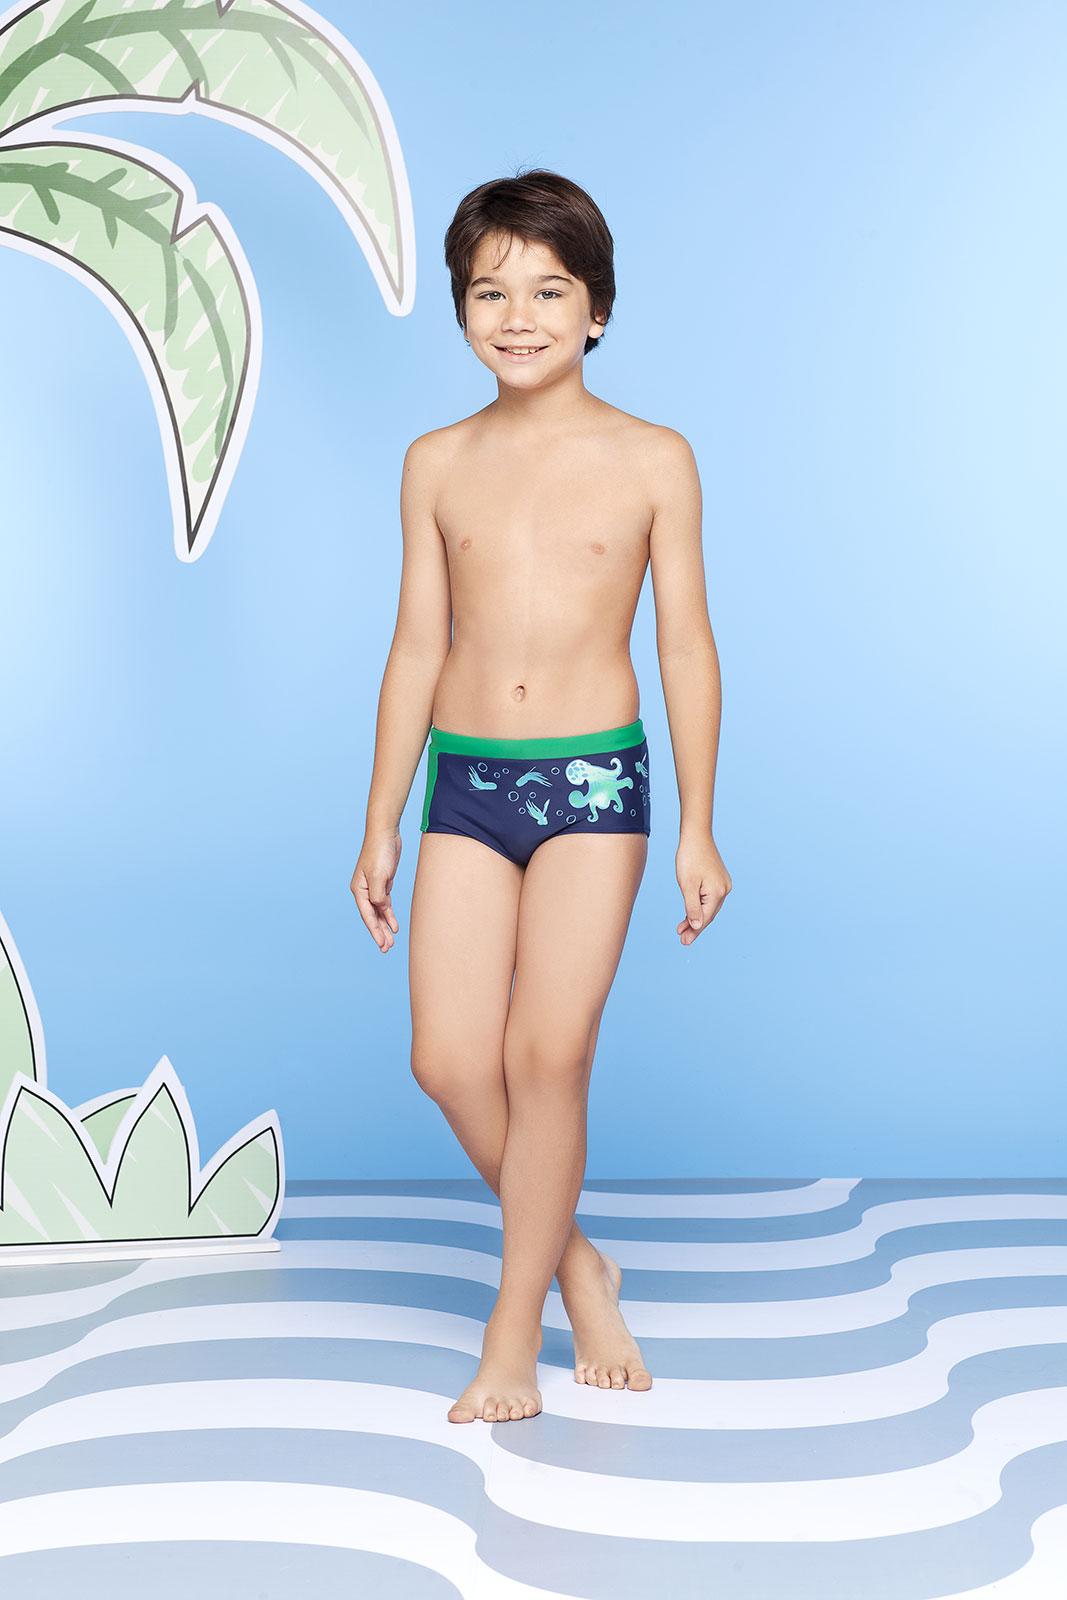 Boys` Navy Blue And Green Octopus Print Swim Trunks - Polvo